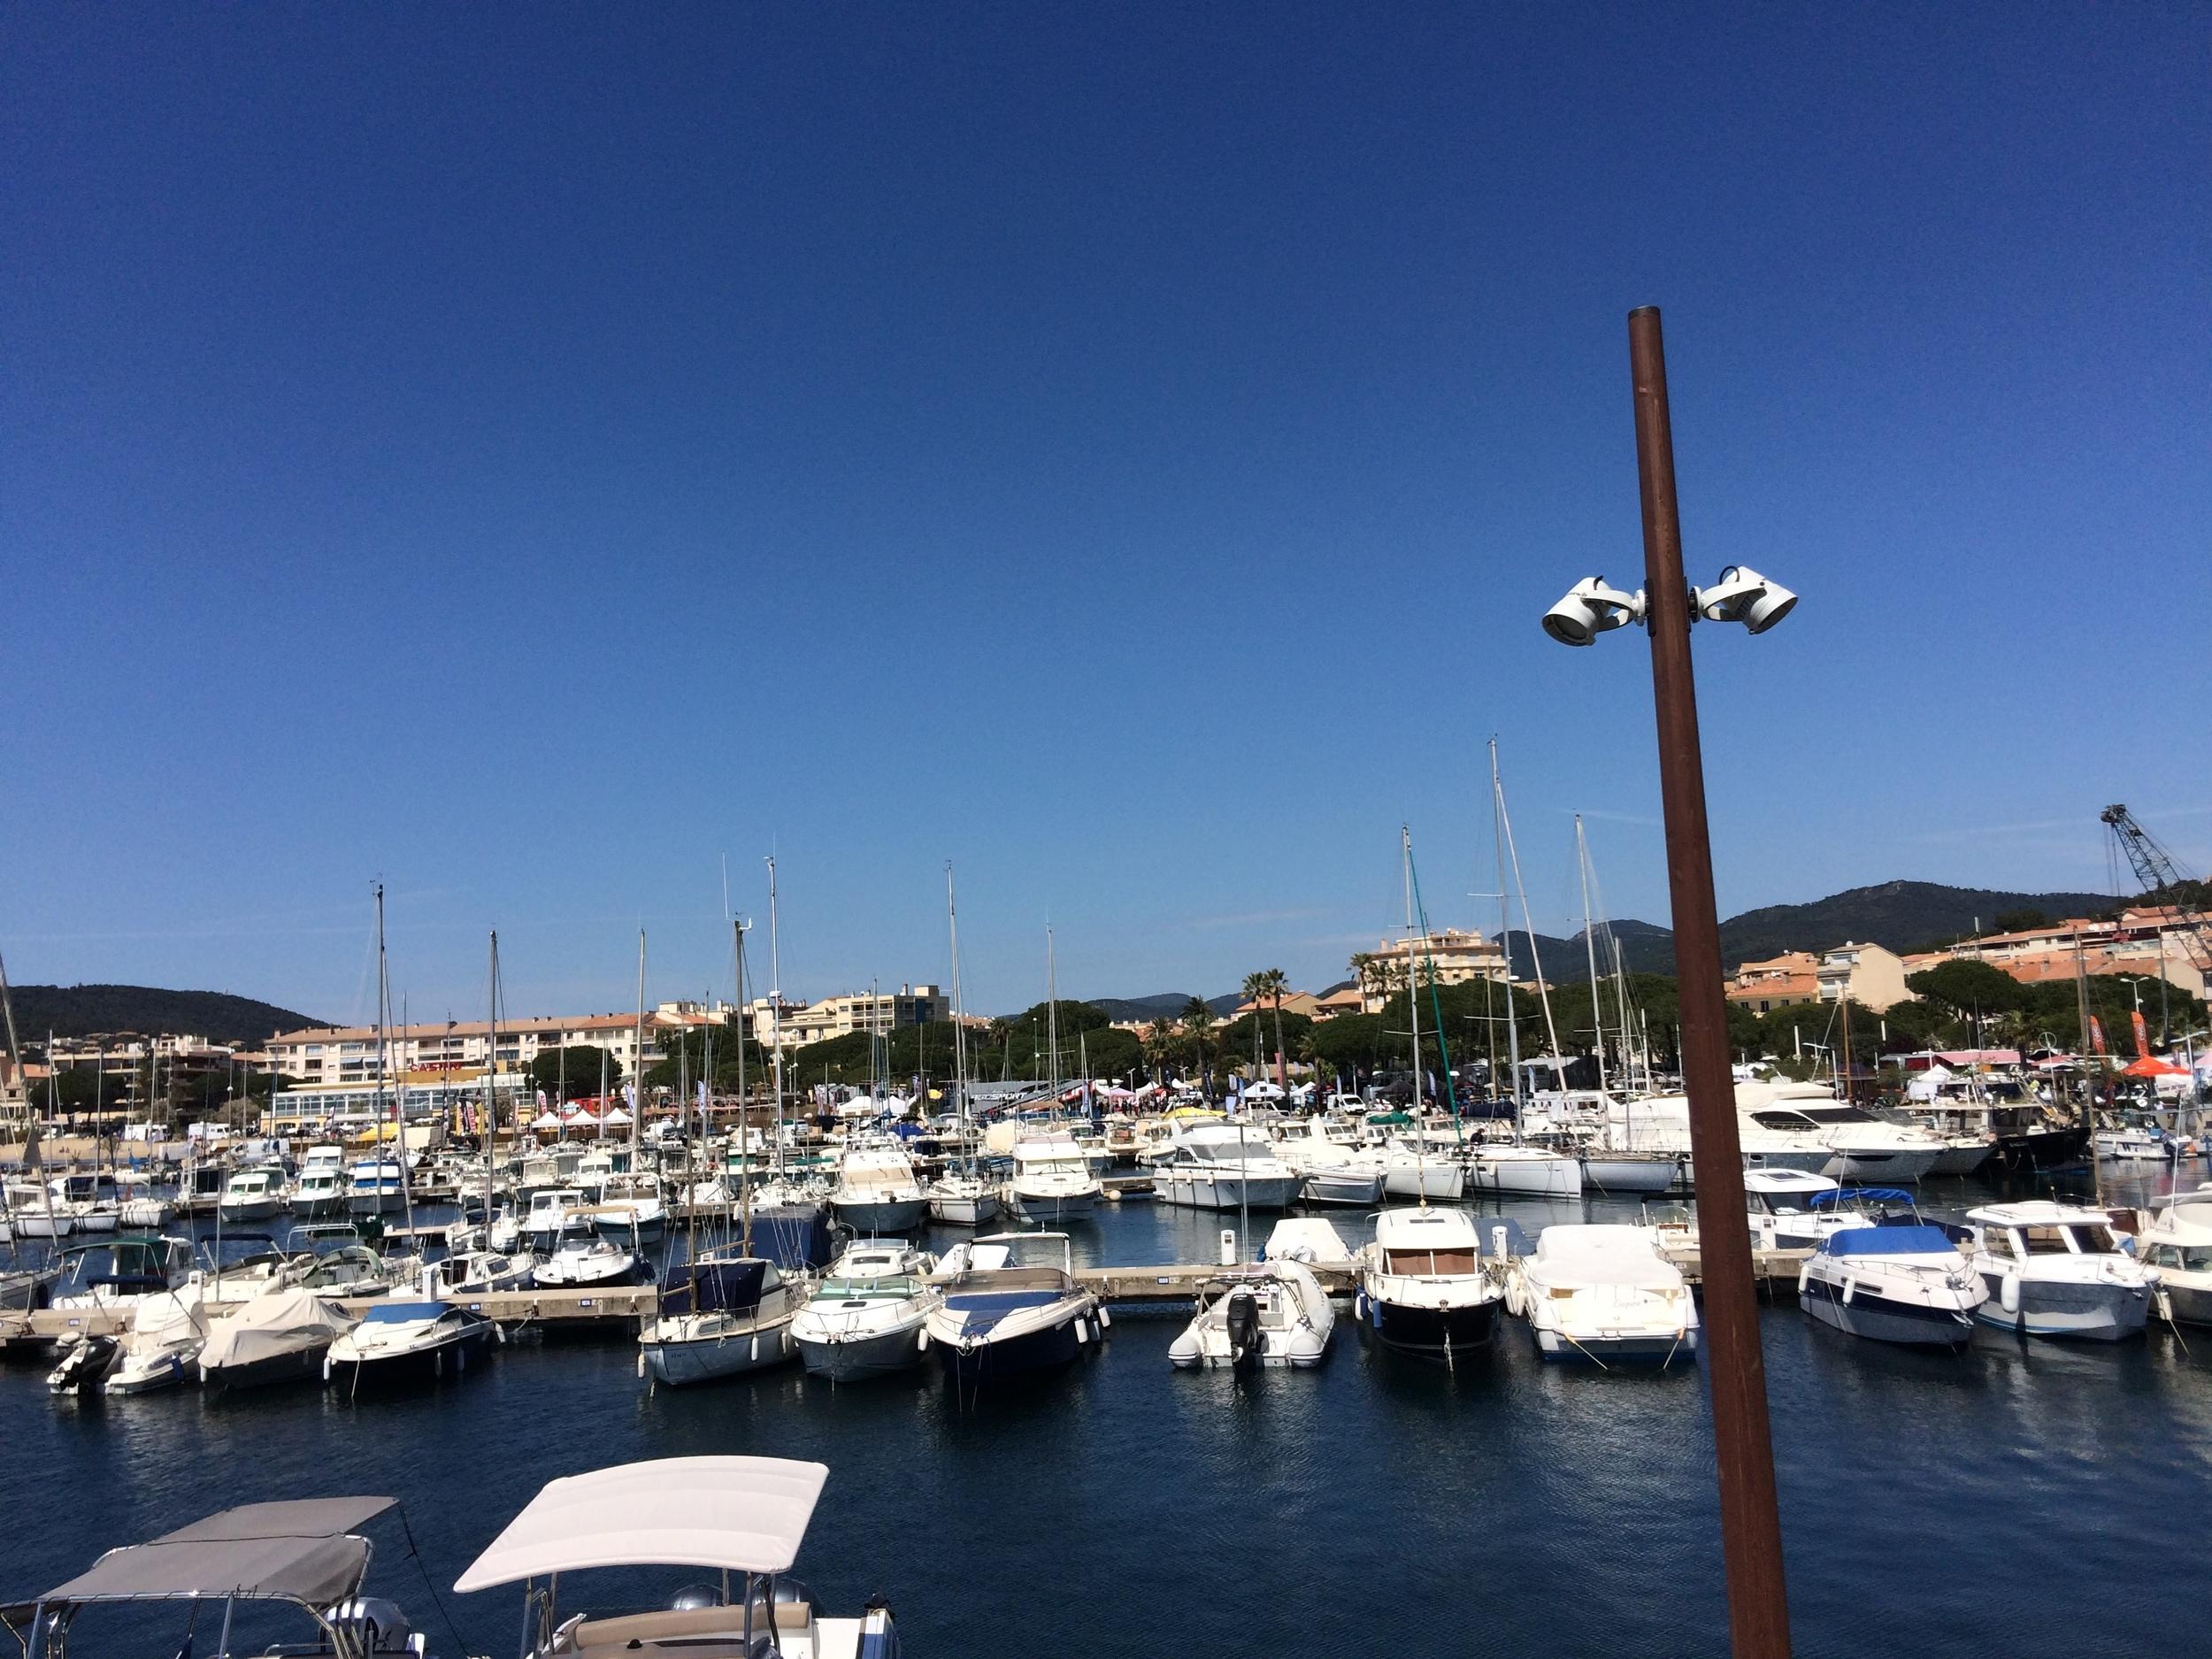 The Marina at Ste Maxime